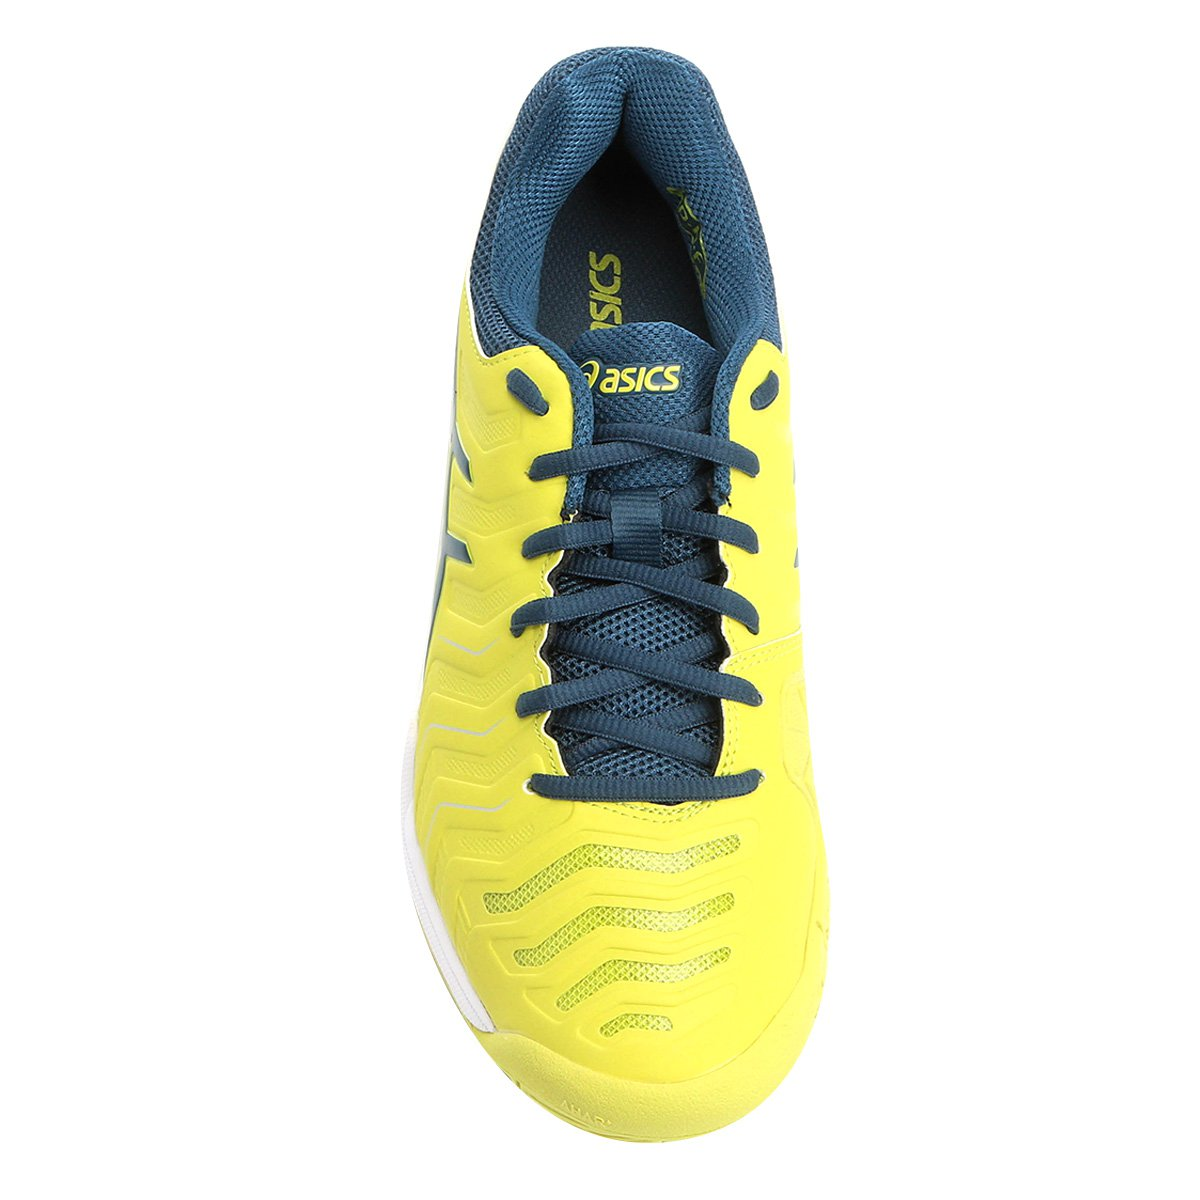 Tênis Asics Gel-Challenger 11 Masculino - Amarelo - Compre Agora ... 44c423254ea41